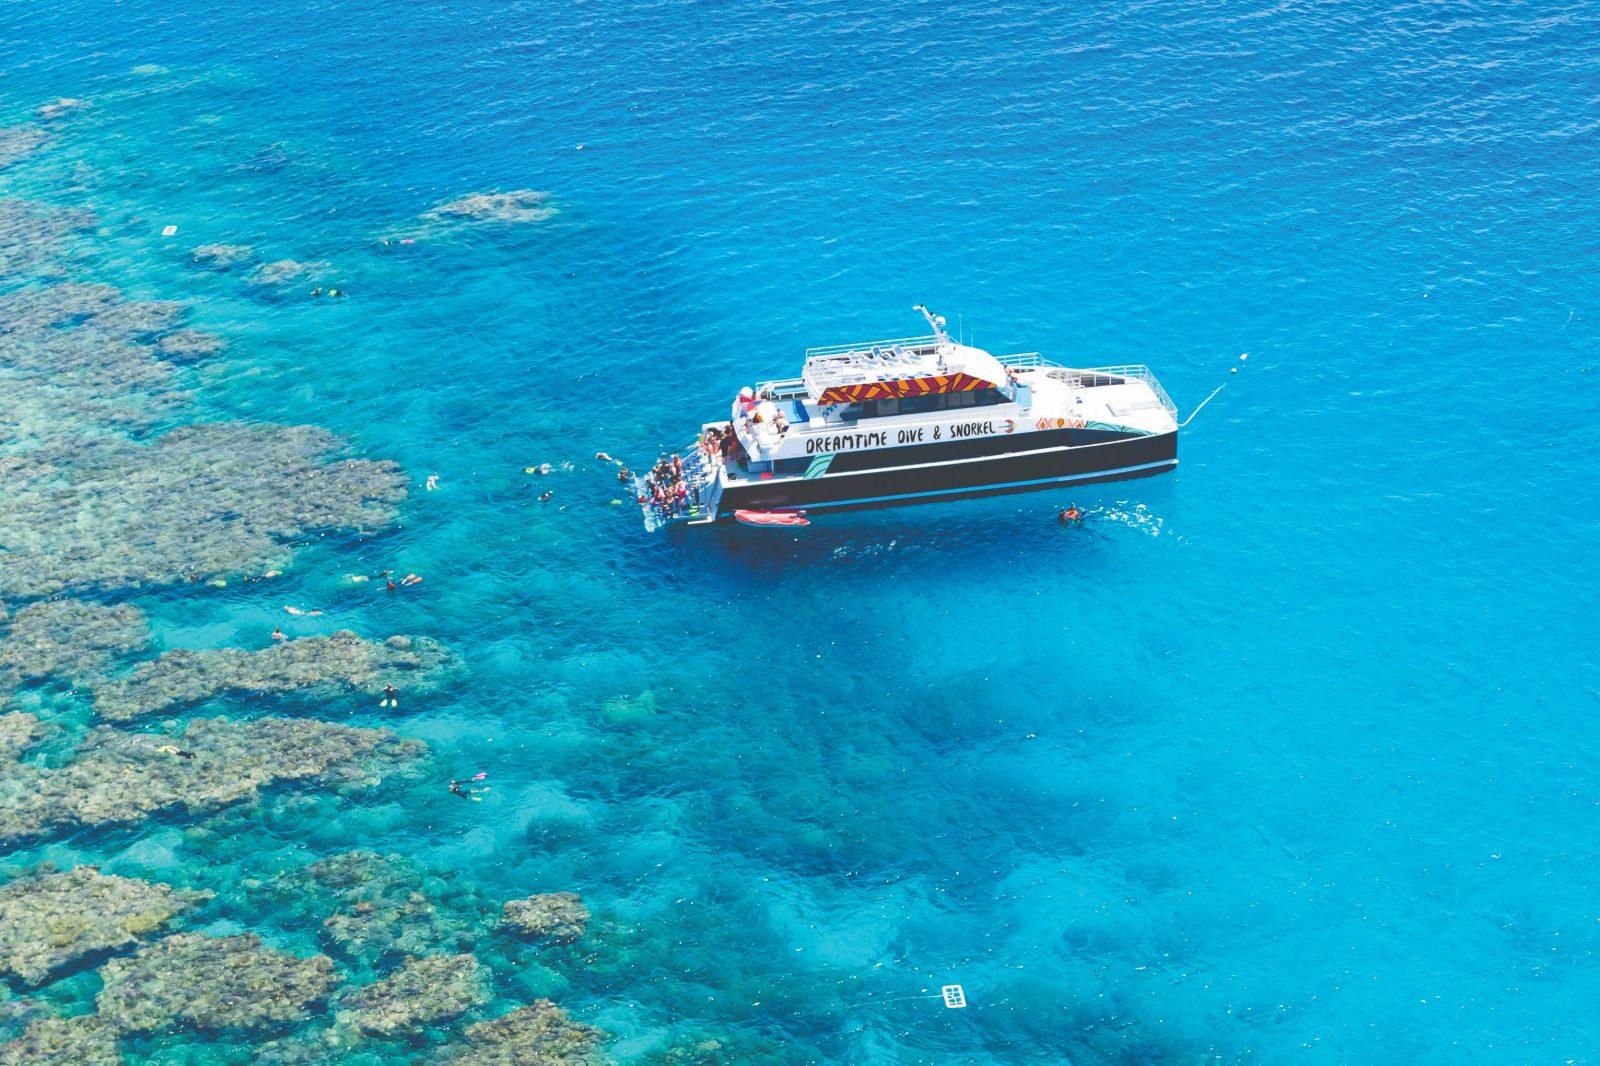 Vessel at Reef